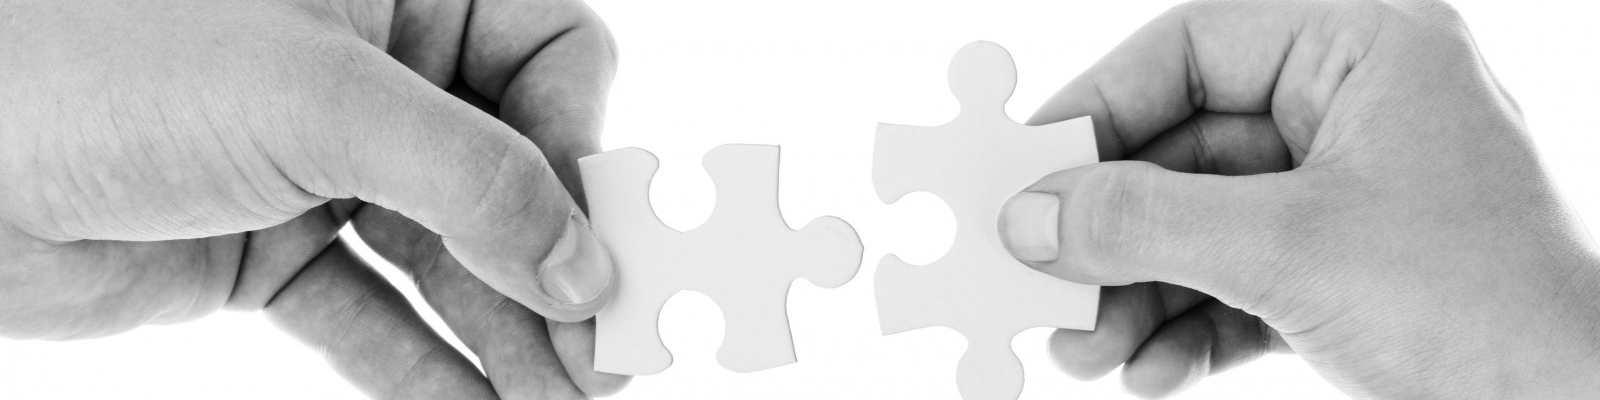 CRM como diferencial competitivo